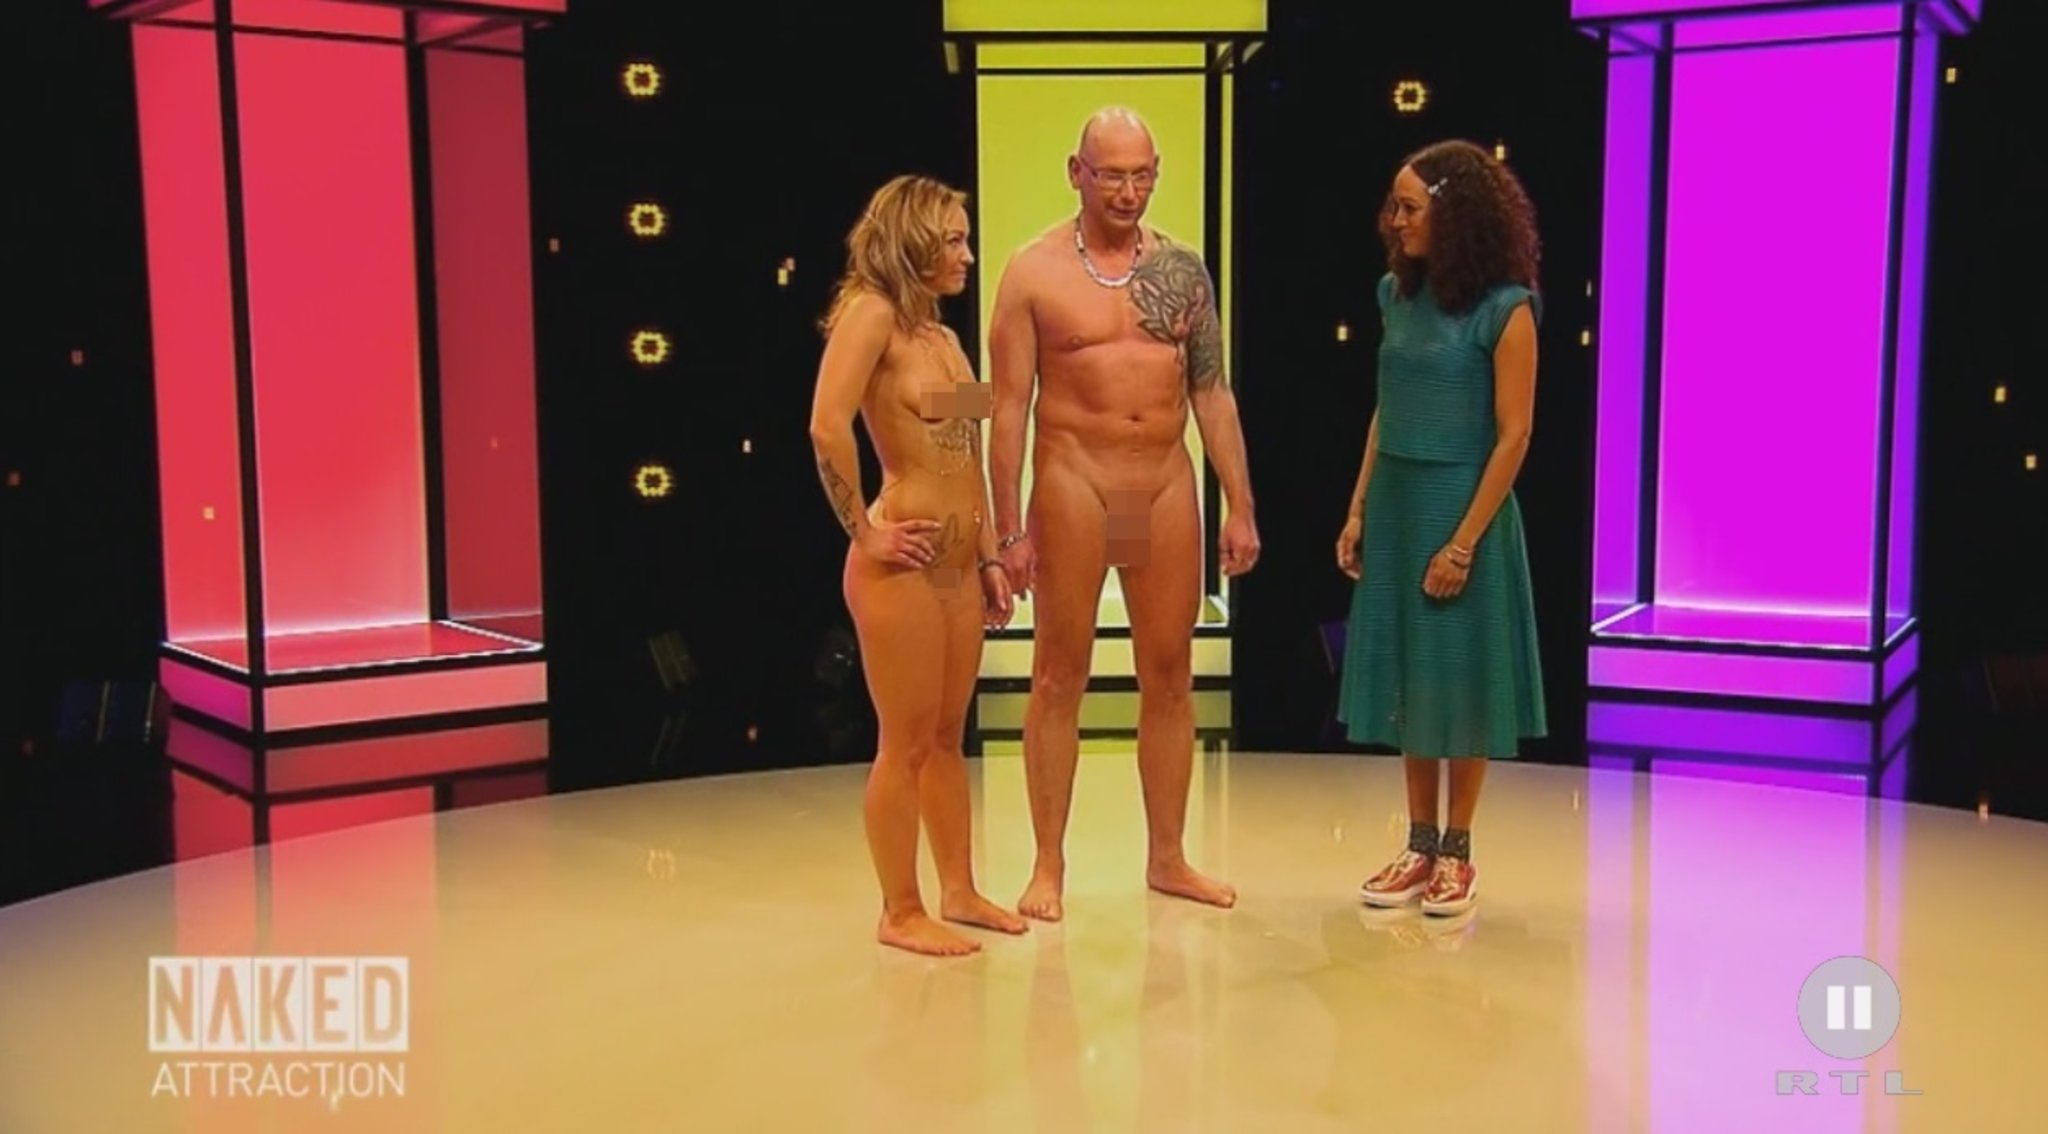 Attraction frauen nackt naked German nude,